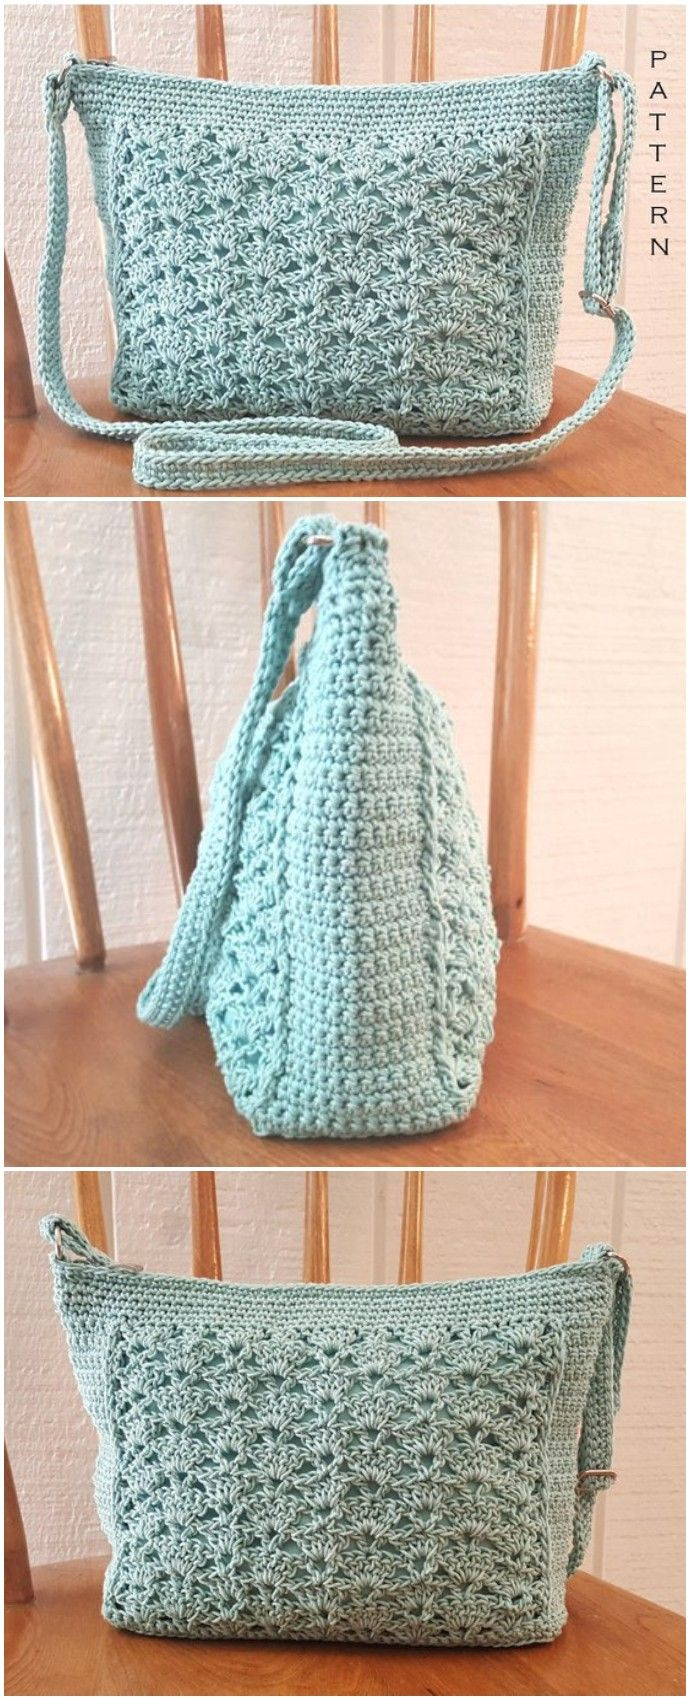 Crochet Bag Pattern – Easy Crochet Patterns